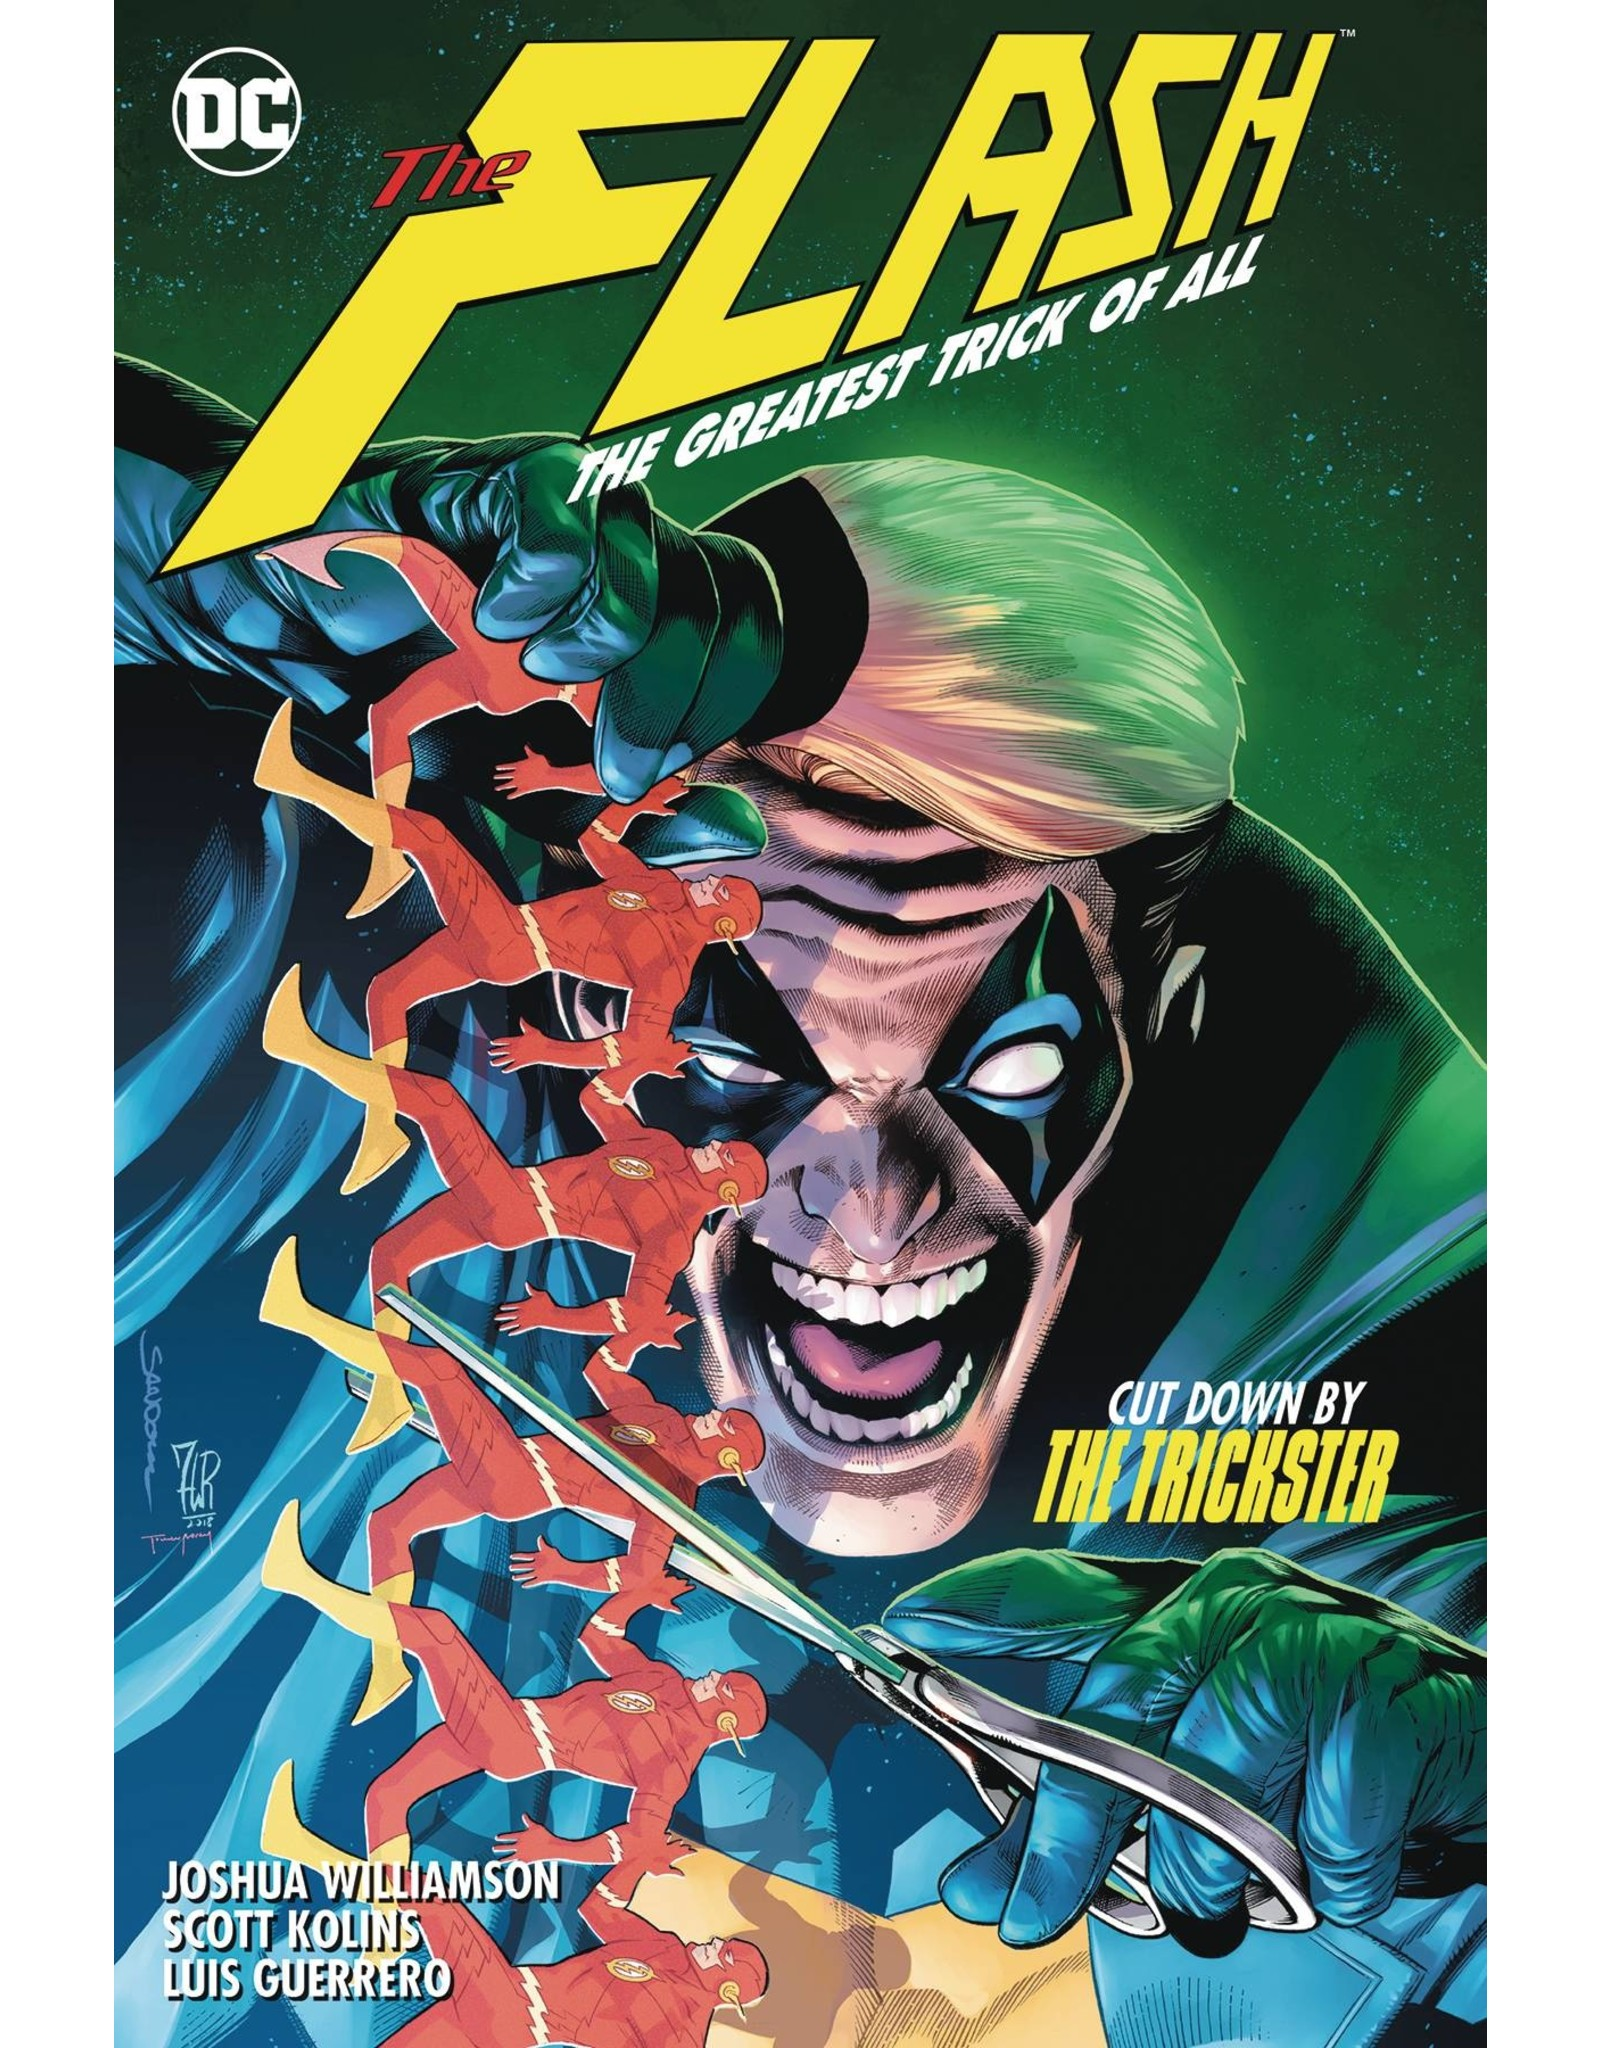 DC COMICS FLASH TP VOL 11 GREATEST TRICK OF ALL